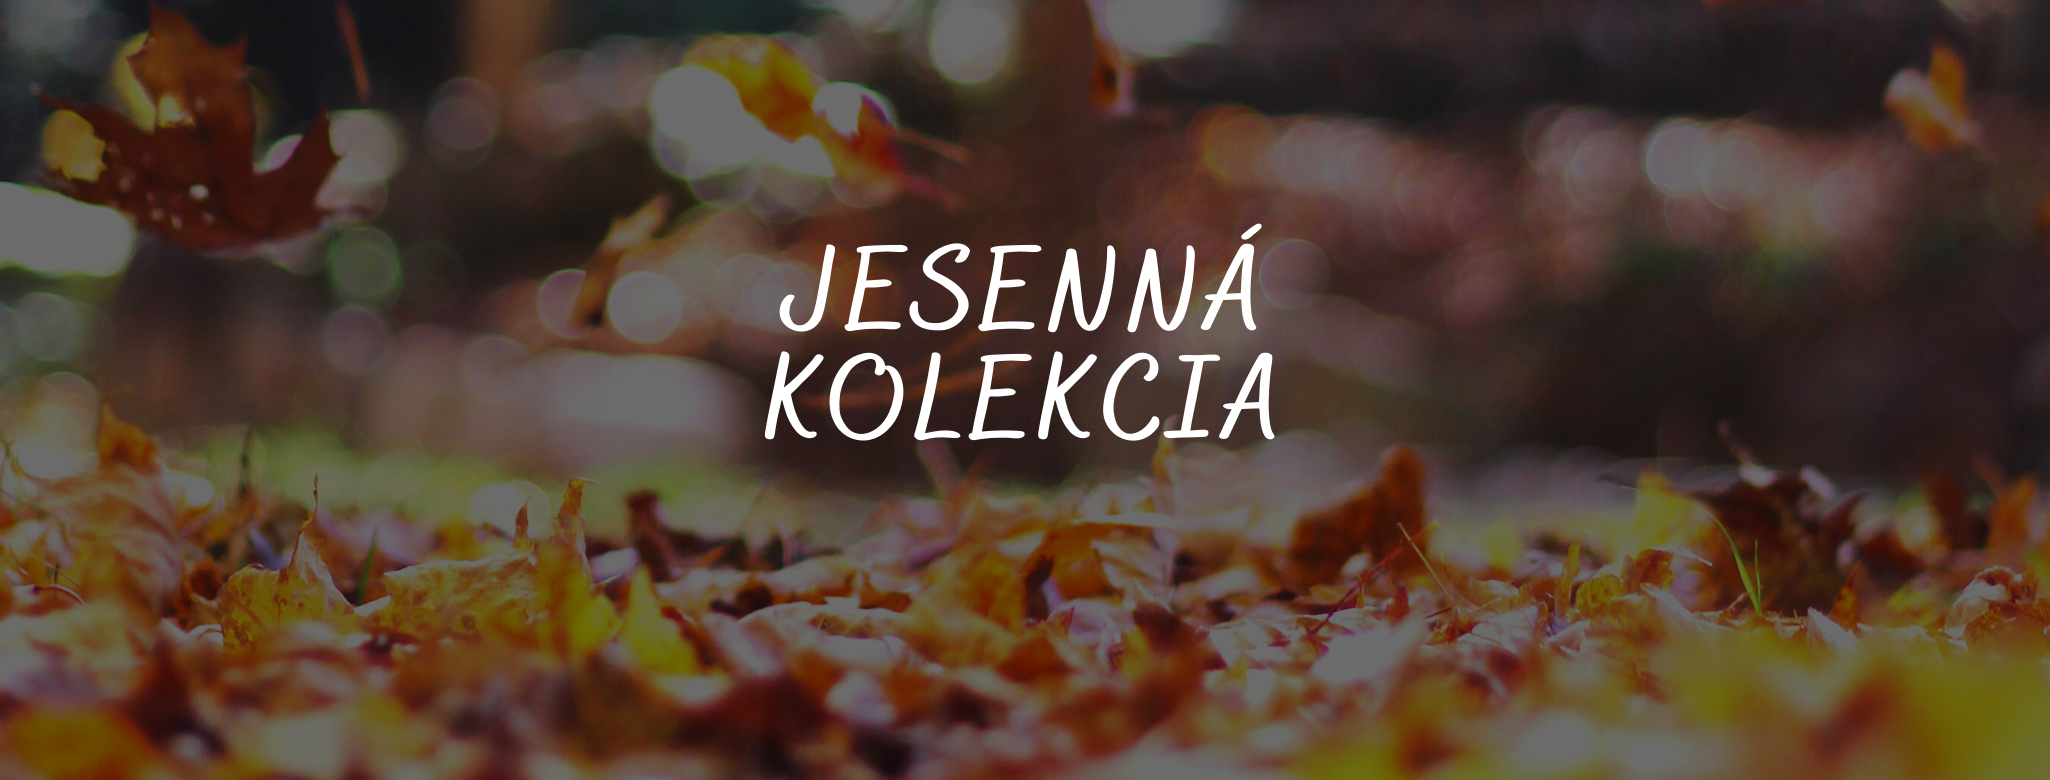 jesenna kolekcia